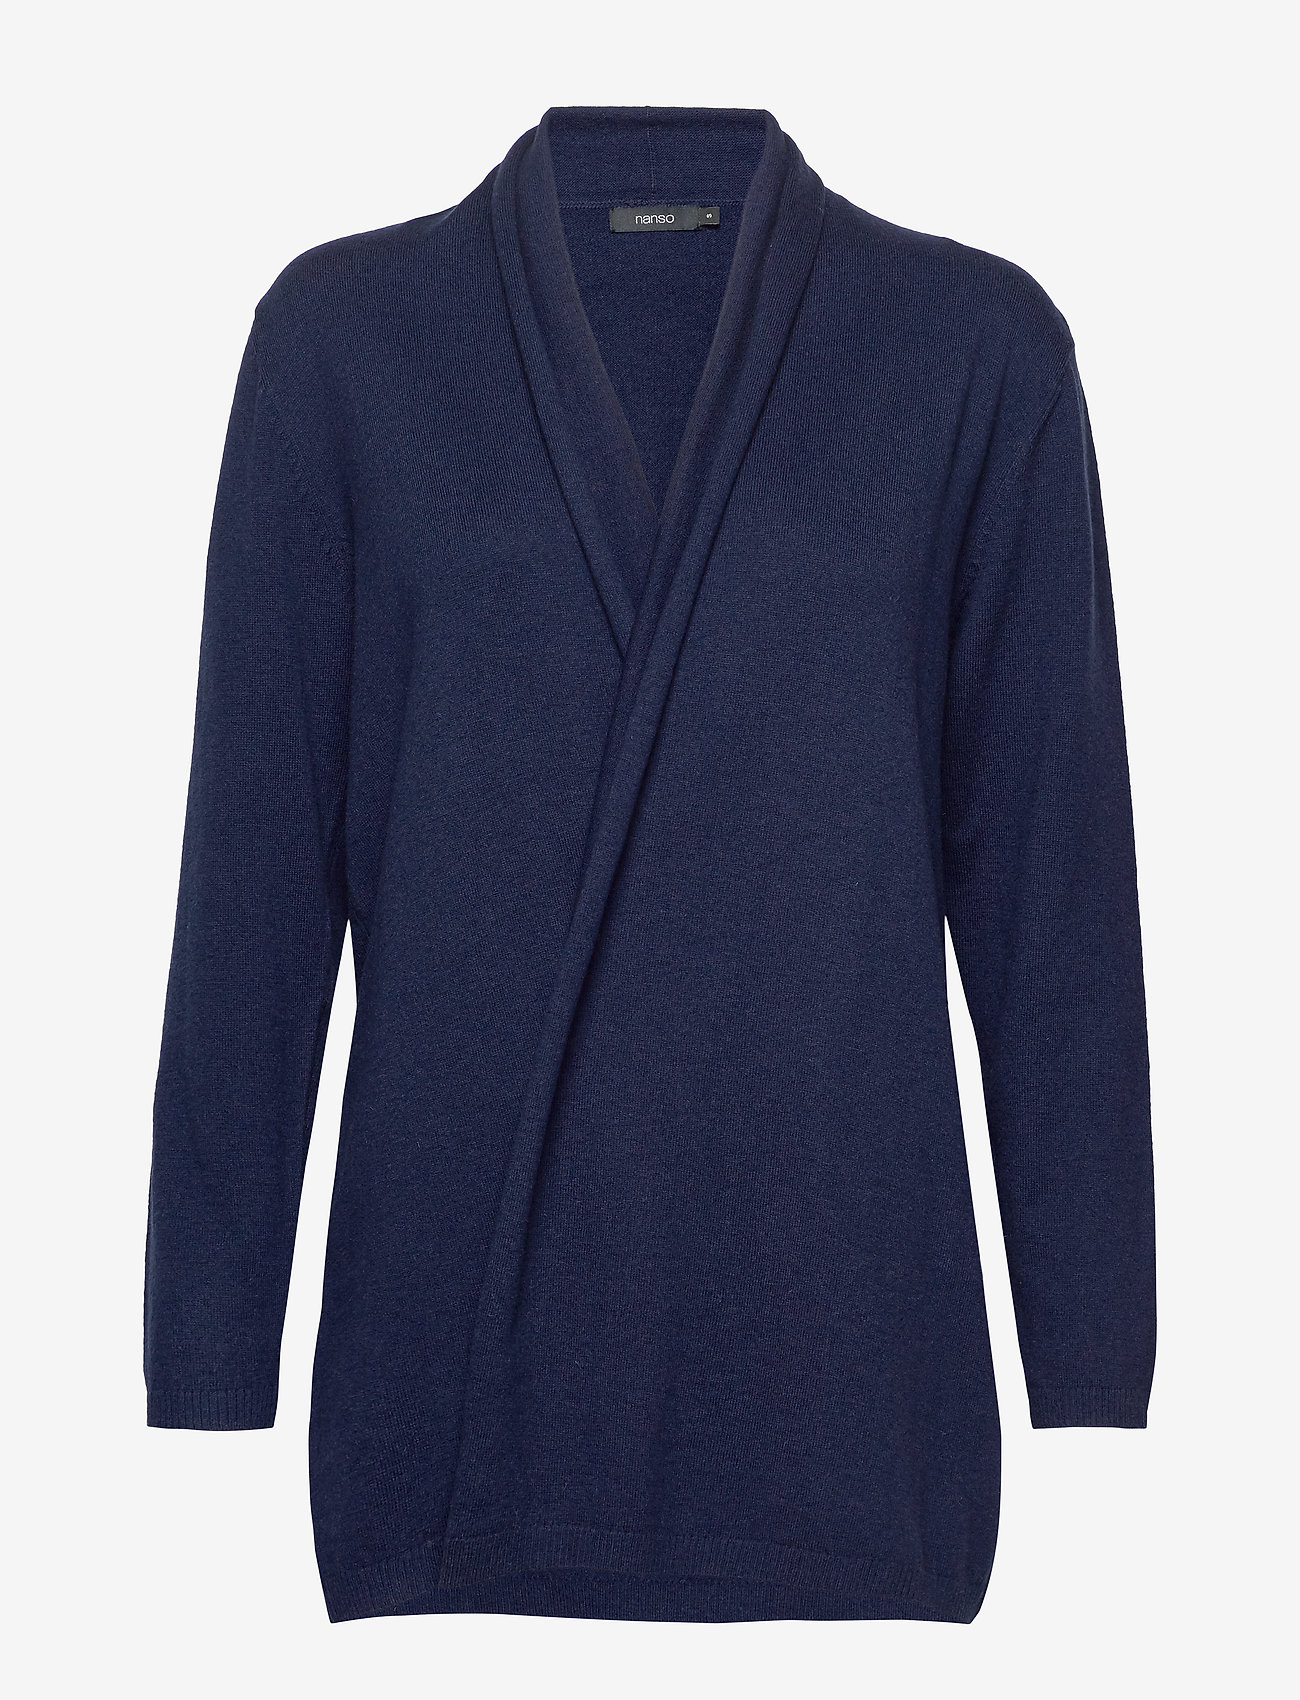 Nanso - Ladies knit cardigan, Villis - neuletakit - dark blue - 0